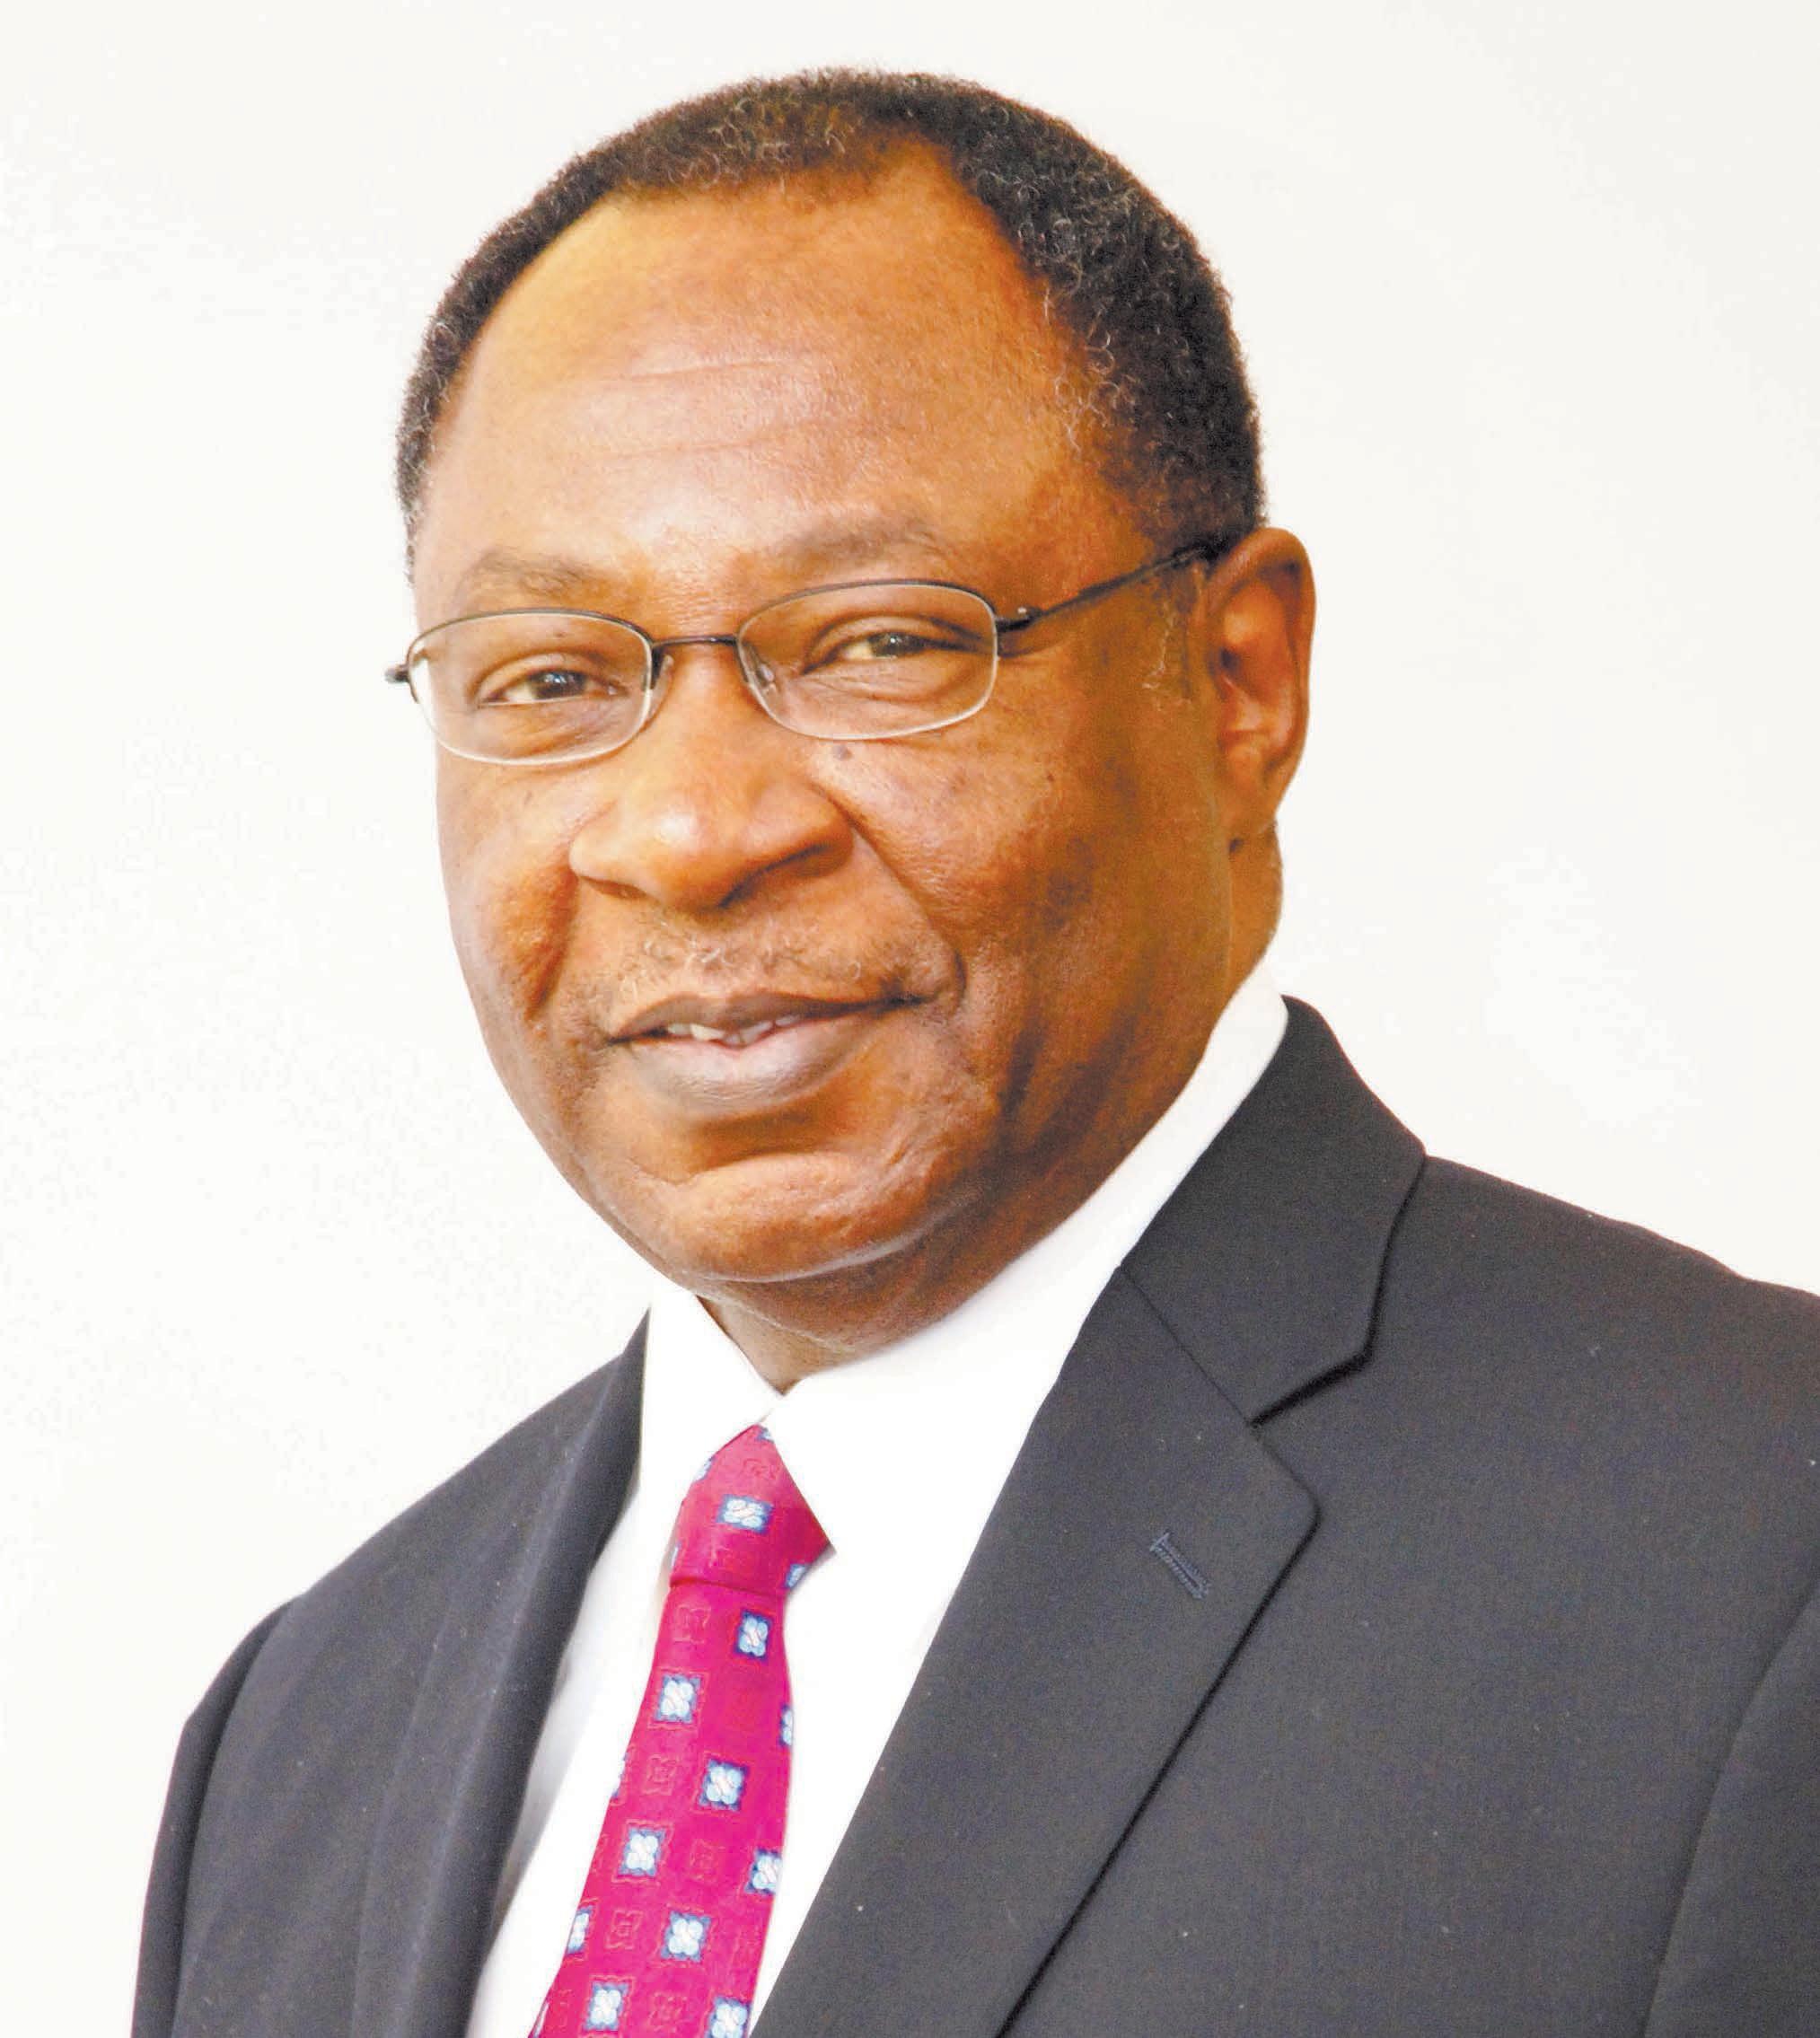 Robert James, President, Carver State Bank